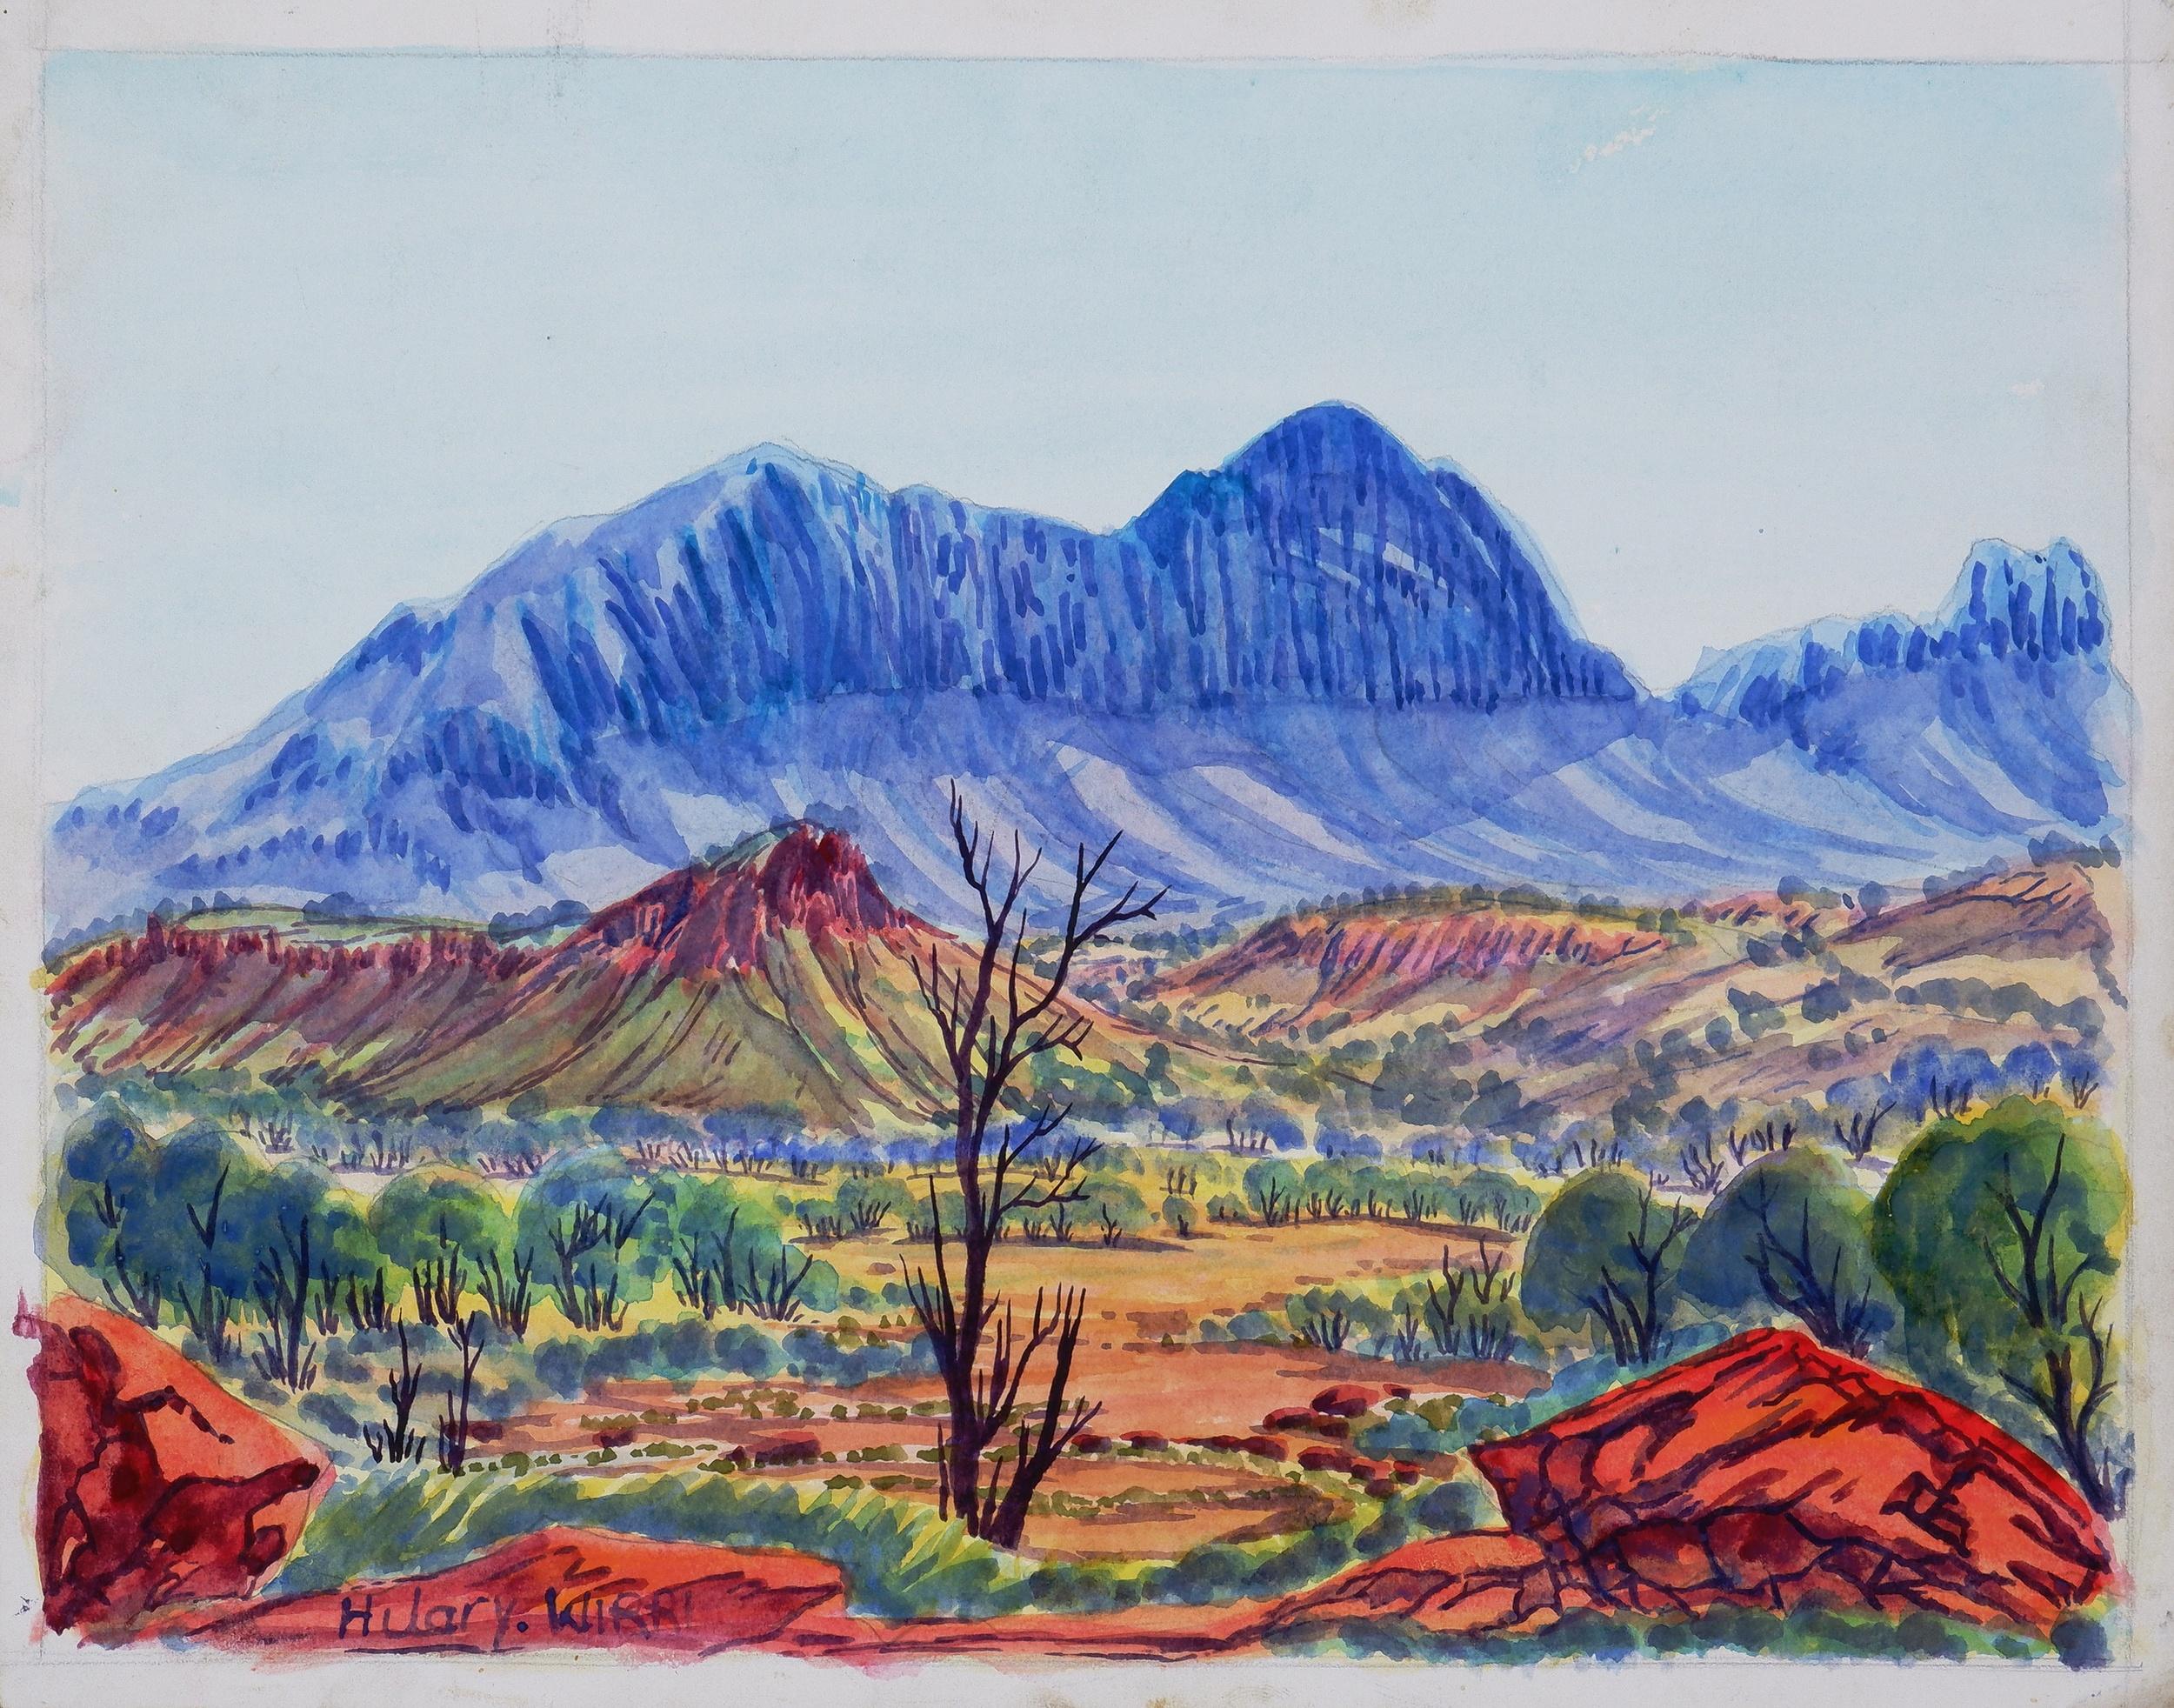 'Hilary Wirri (born 1959), Central Australian Landscape, Watercolour, 24.5 x 31.5cm'